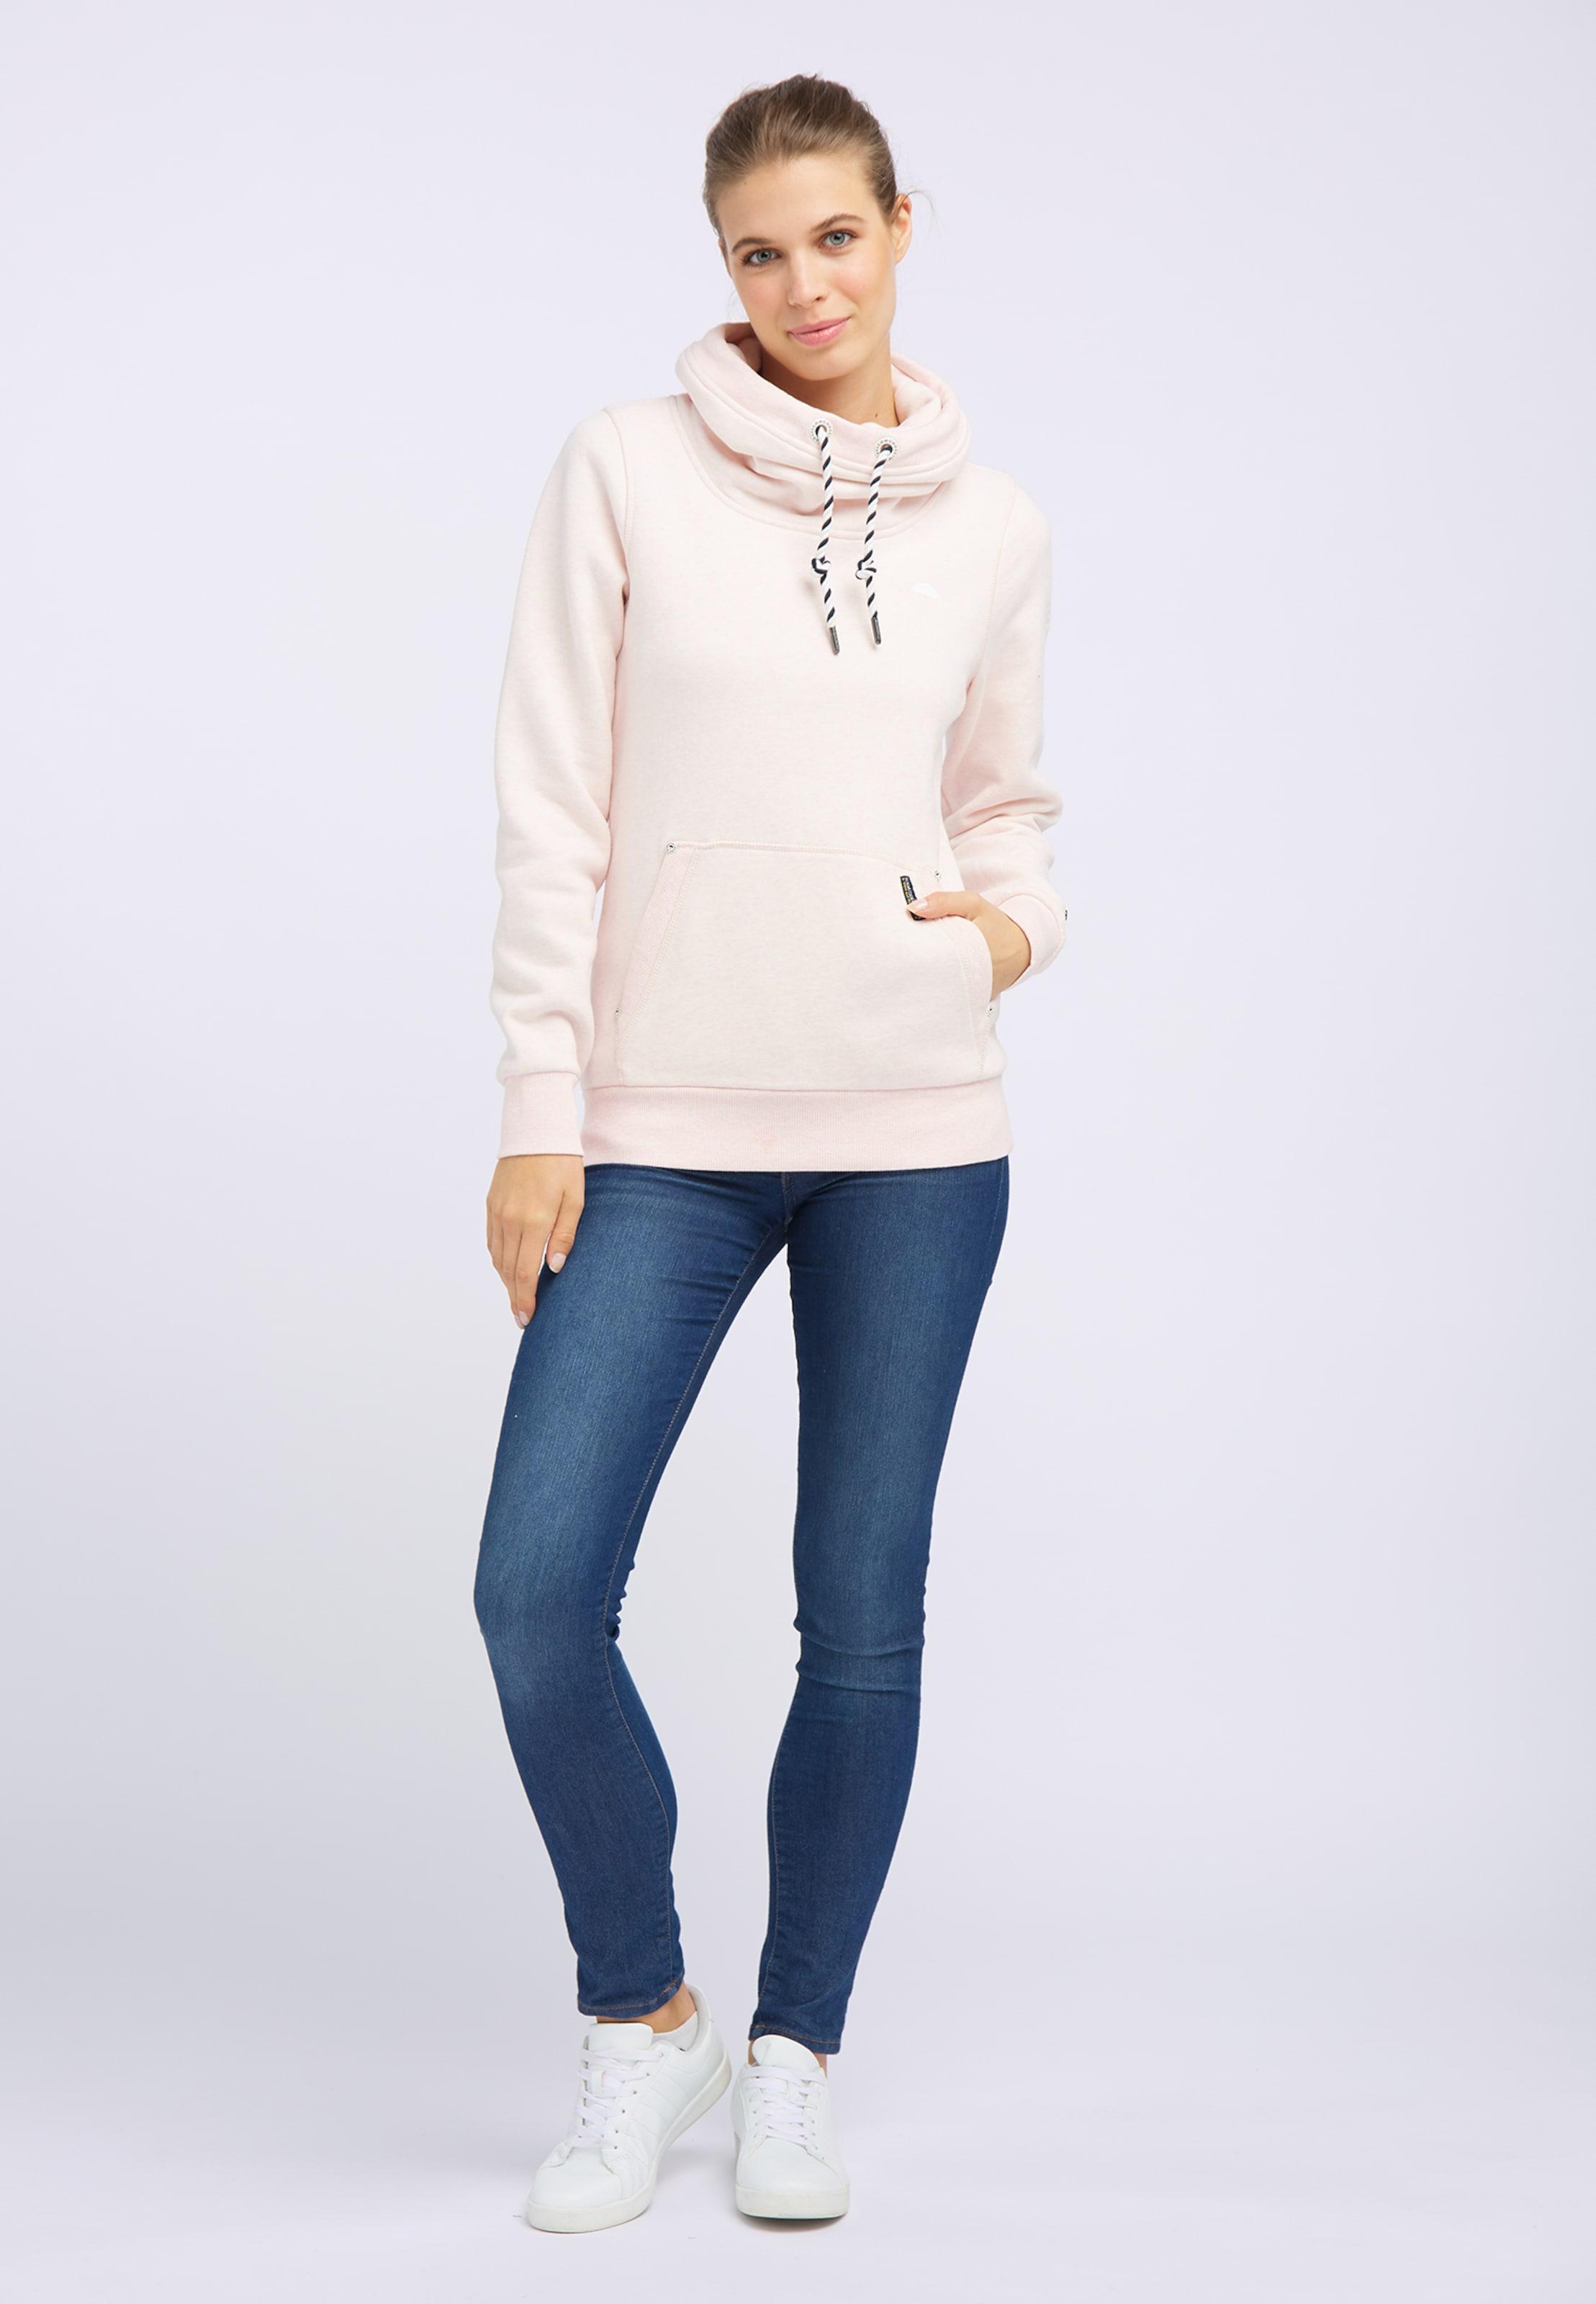 Puder Schmuddelwedda Sweatshirt In In In Schmuddelwedda Puder Schmuddelwedda Sweatshirt Sweatshirt Puder 8k0XNnPwO